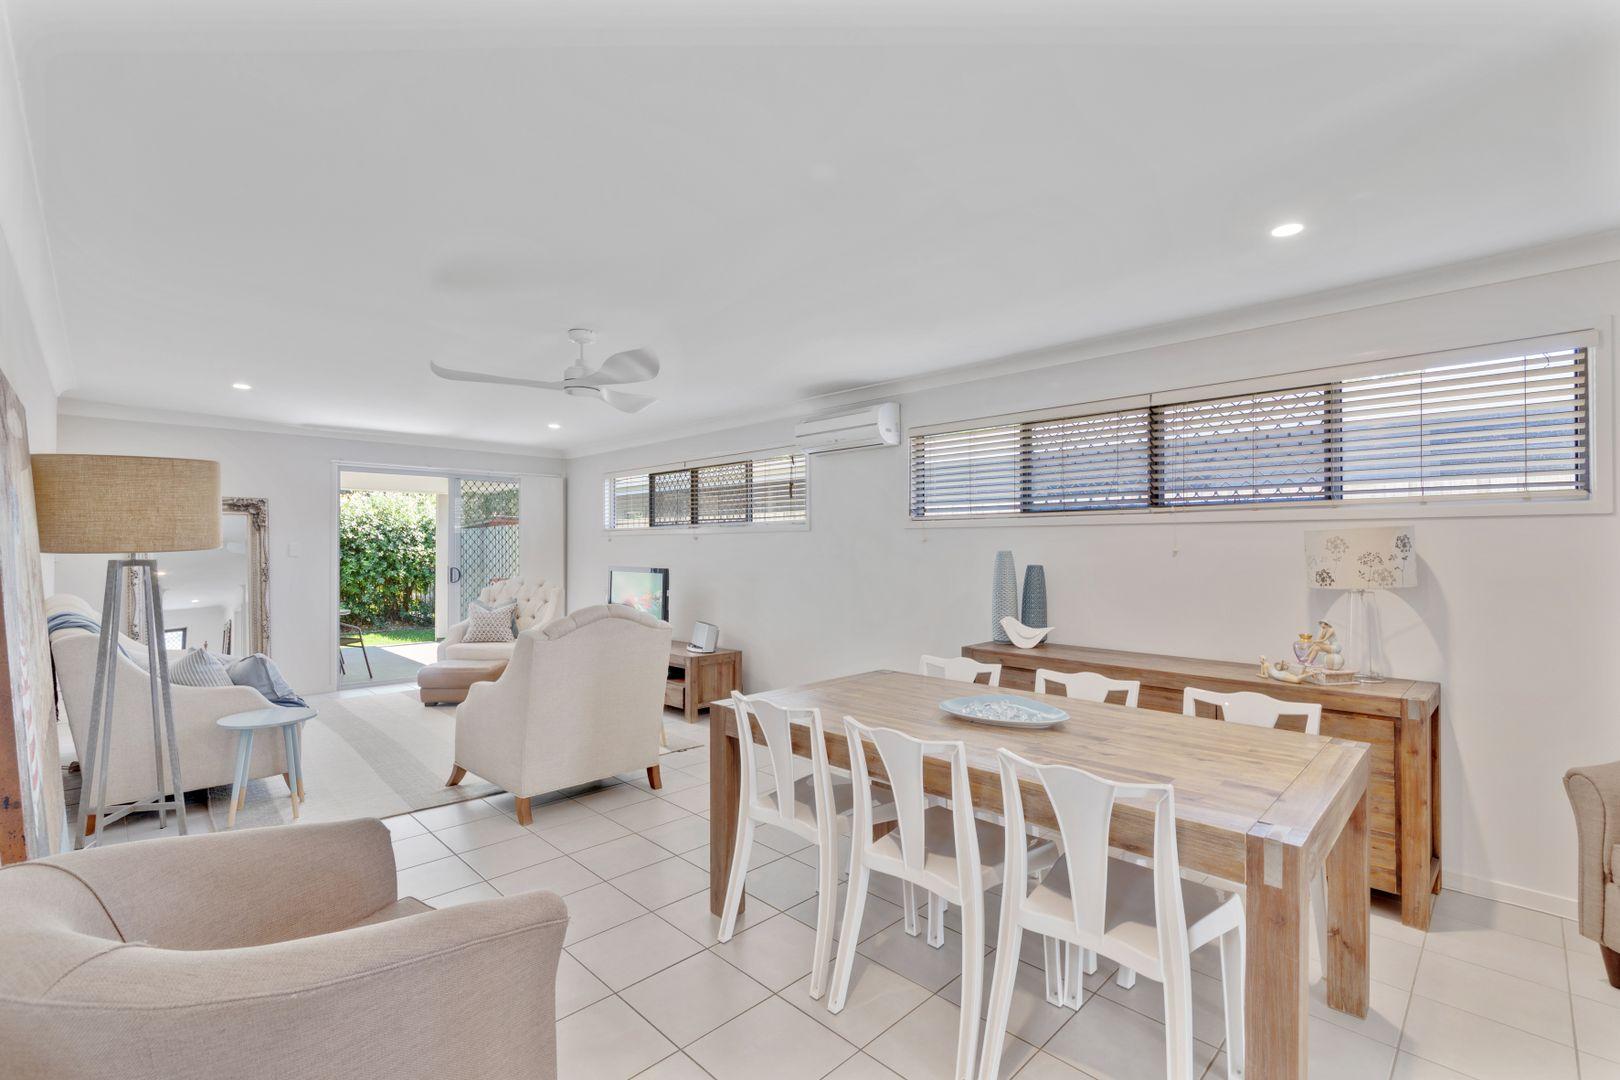 Unit 12 'Urban Sanctuary Villas' 47 Sycamore Drive, Currimundi QLD 4551, Image 1